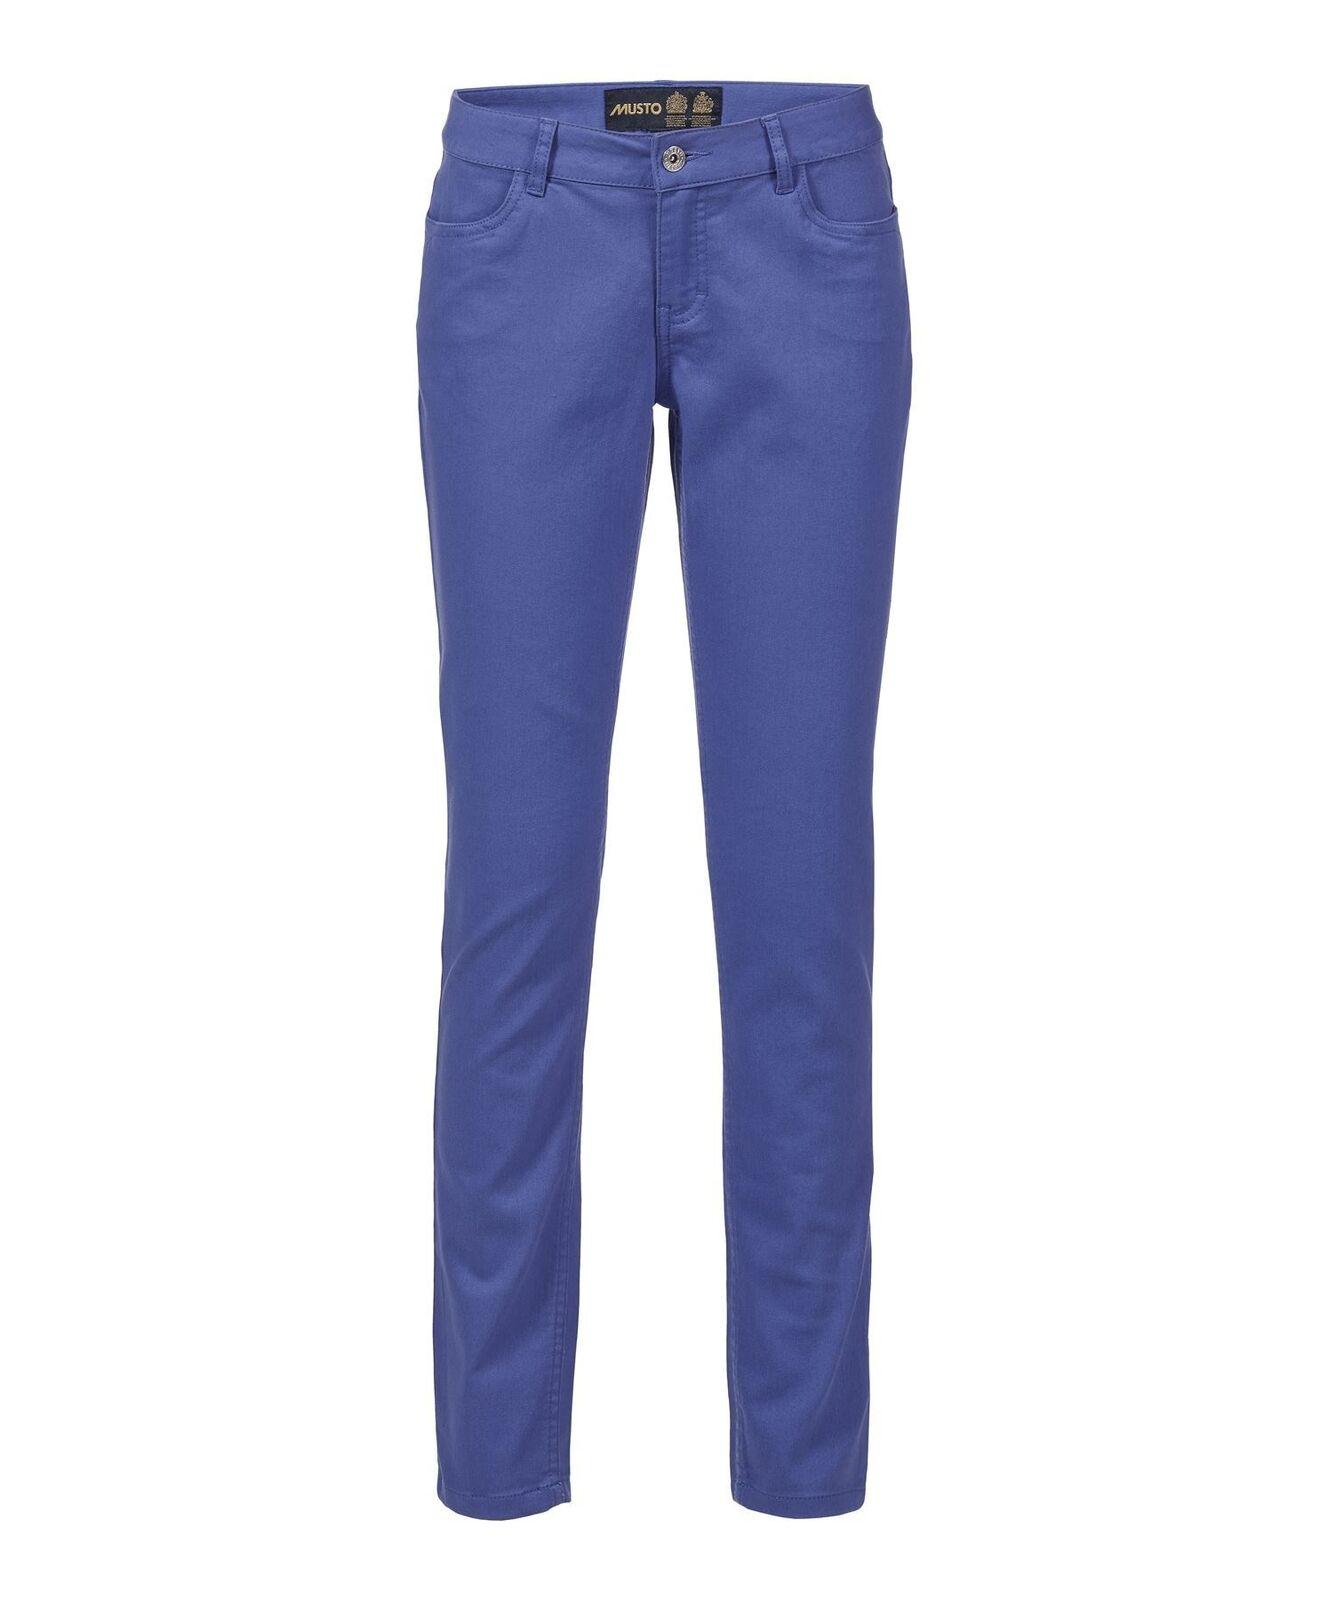 Musto Carolina Trousers - Dazzling bluee